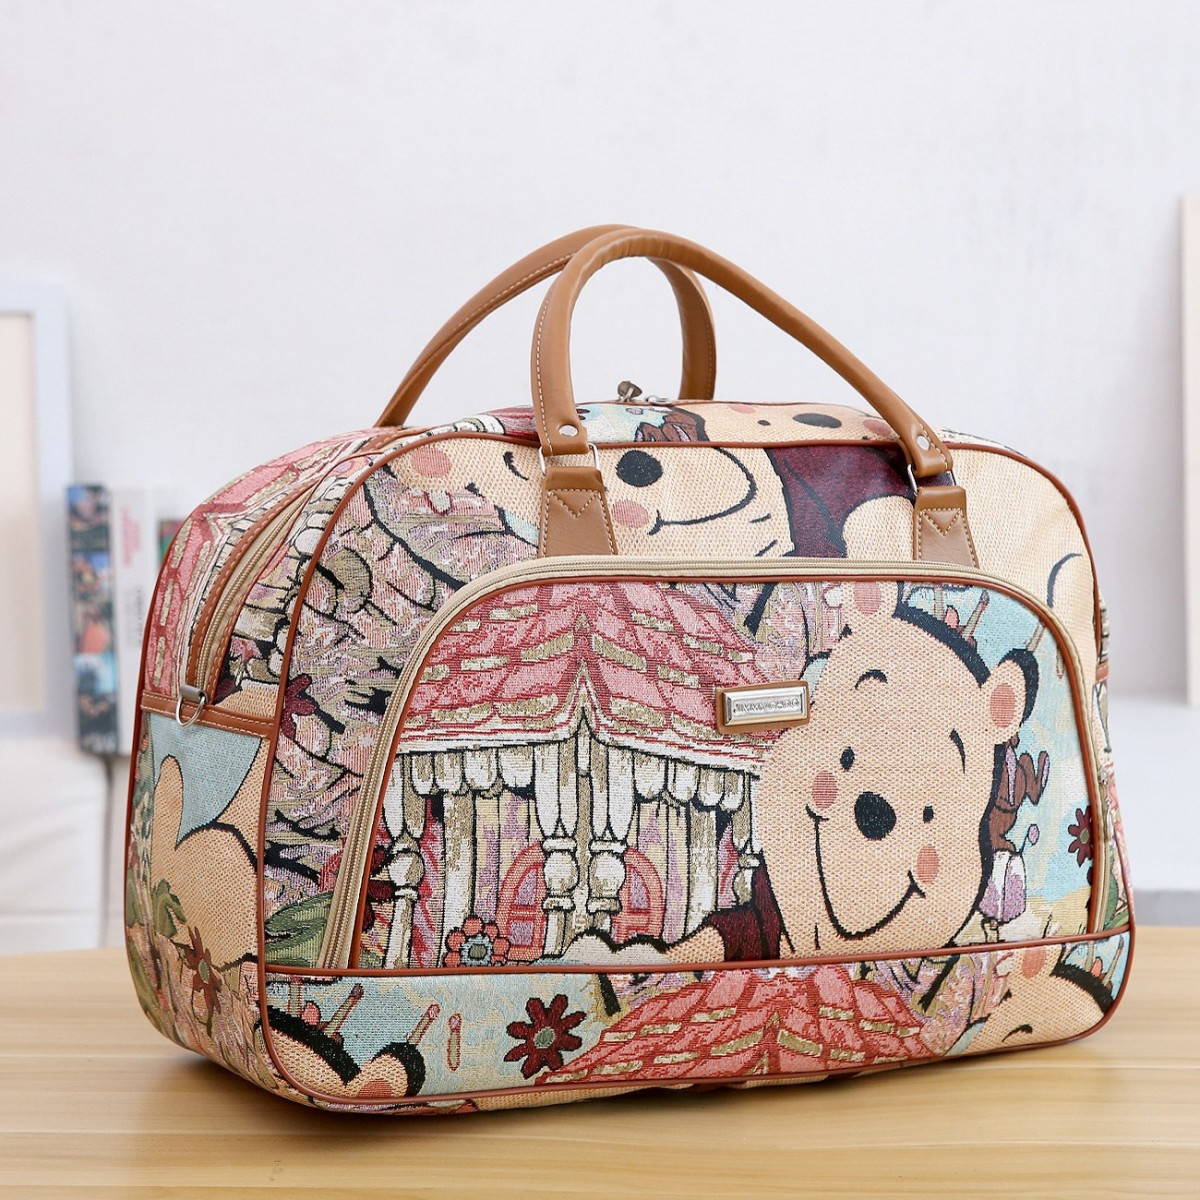 Women Hand PU Leather Travel Duffle Bags Pu Leather Weekend Bag Winnie The Pooh Cartoon Large Waterproof Travel Bag